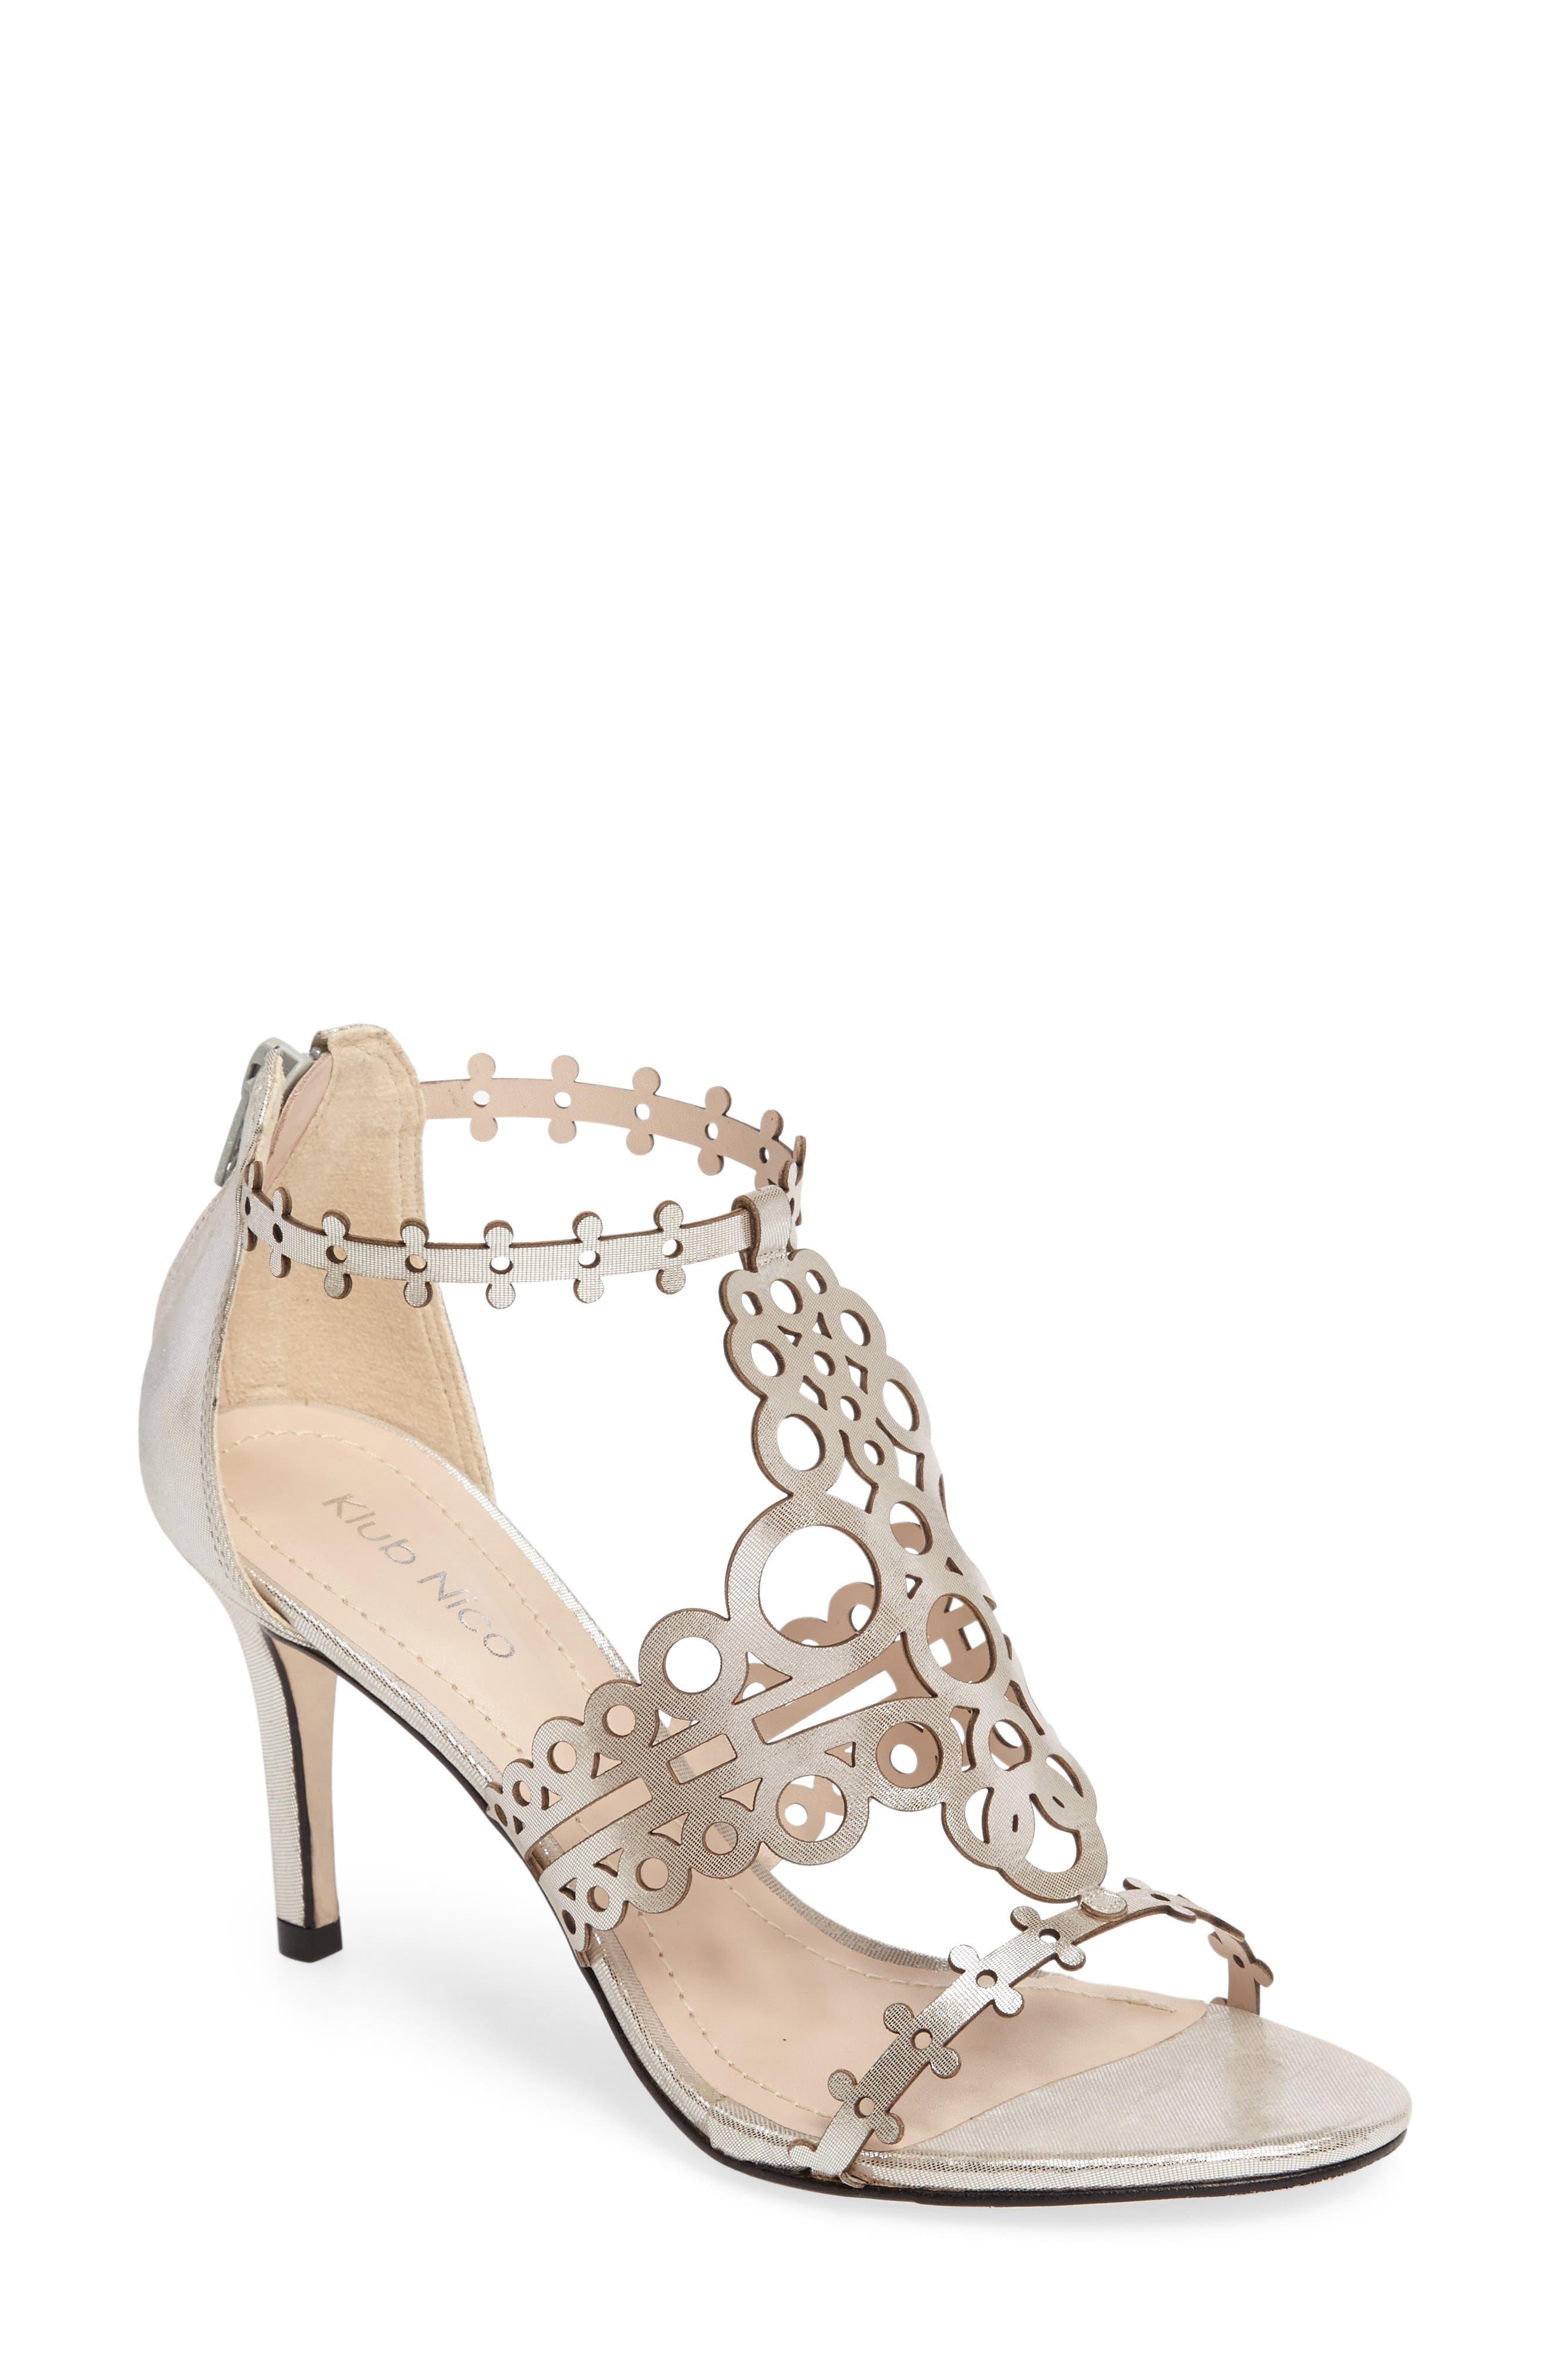 'Antonia' Laser Cut T-Strap Sandal,                             Main thumbnail 1, color,                             Silver Leather